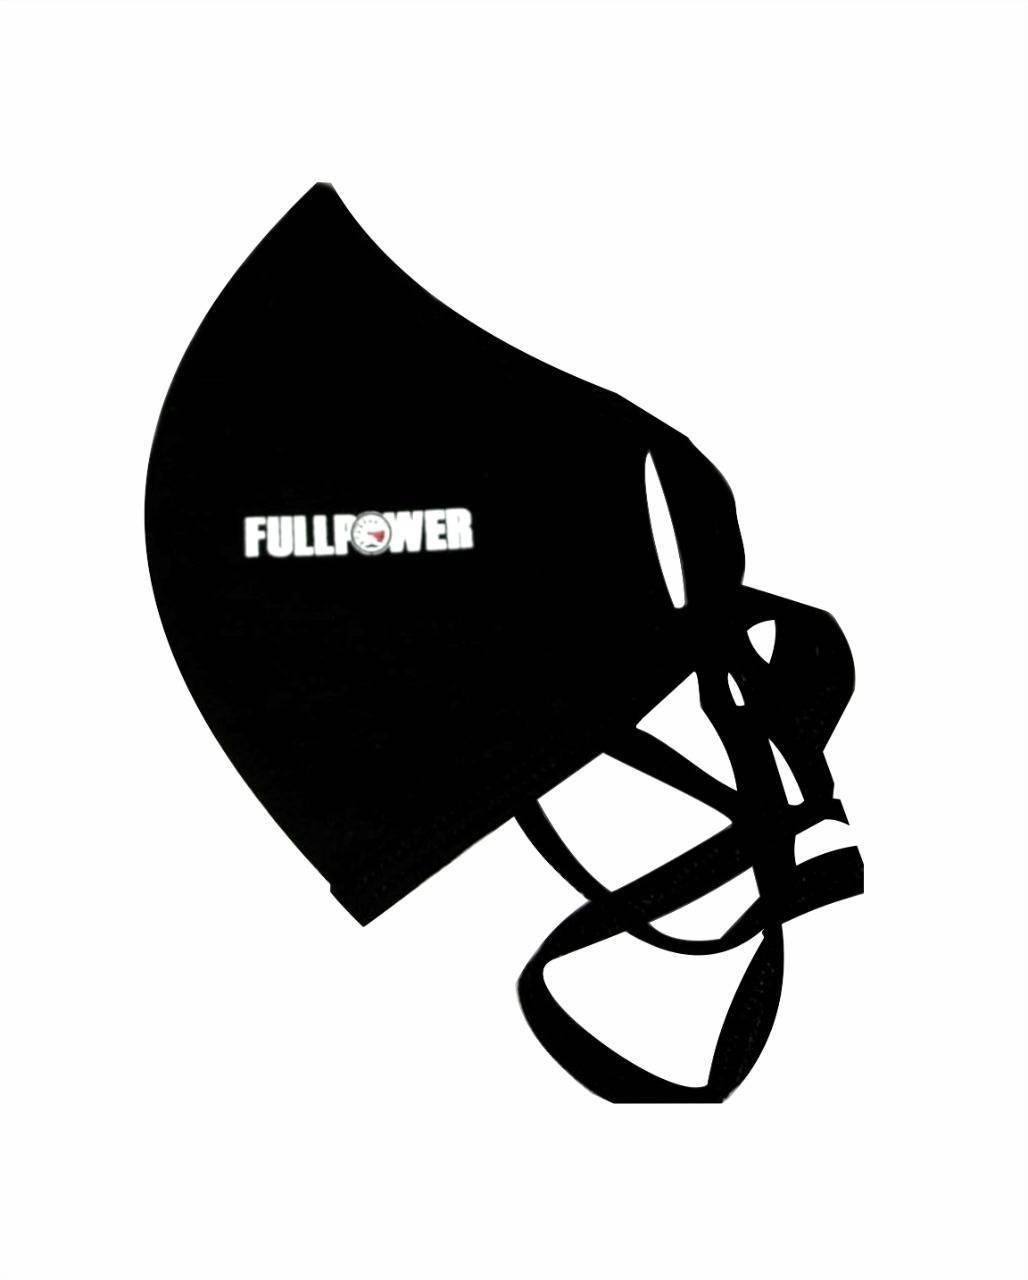 Máscara de Proteção Personalizada FullPower - Loja FullPower